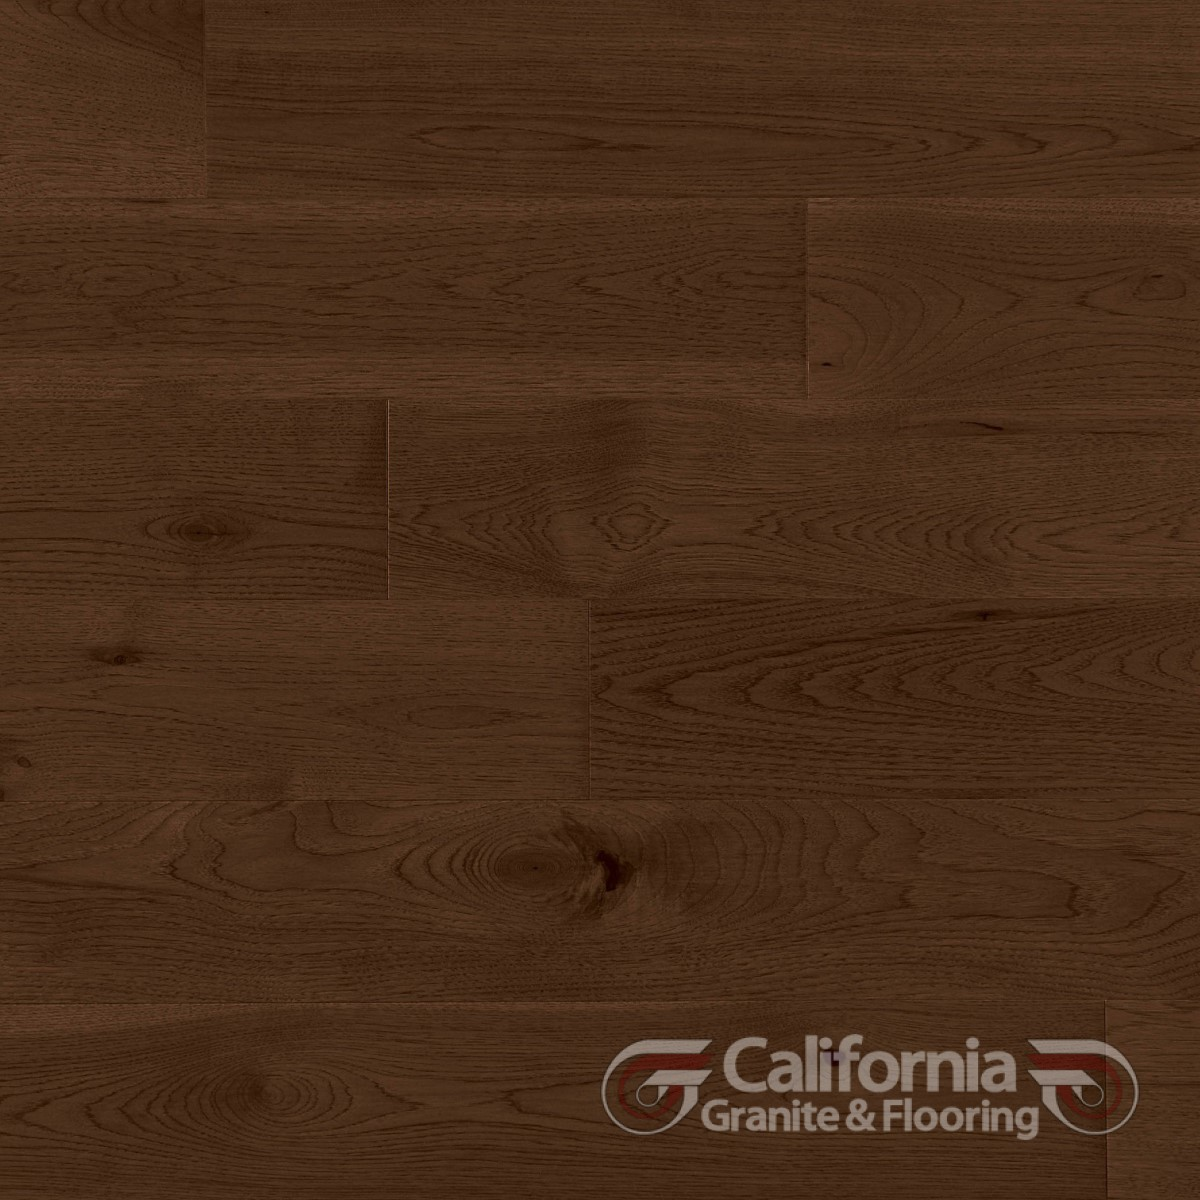 hardwood-flooring-hickory-havana-character-smooth-herringbone-2